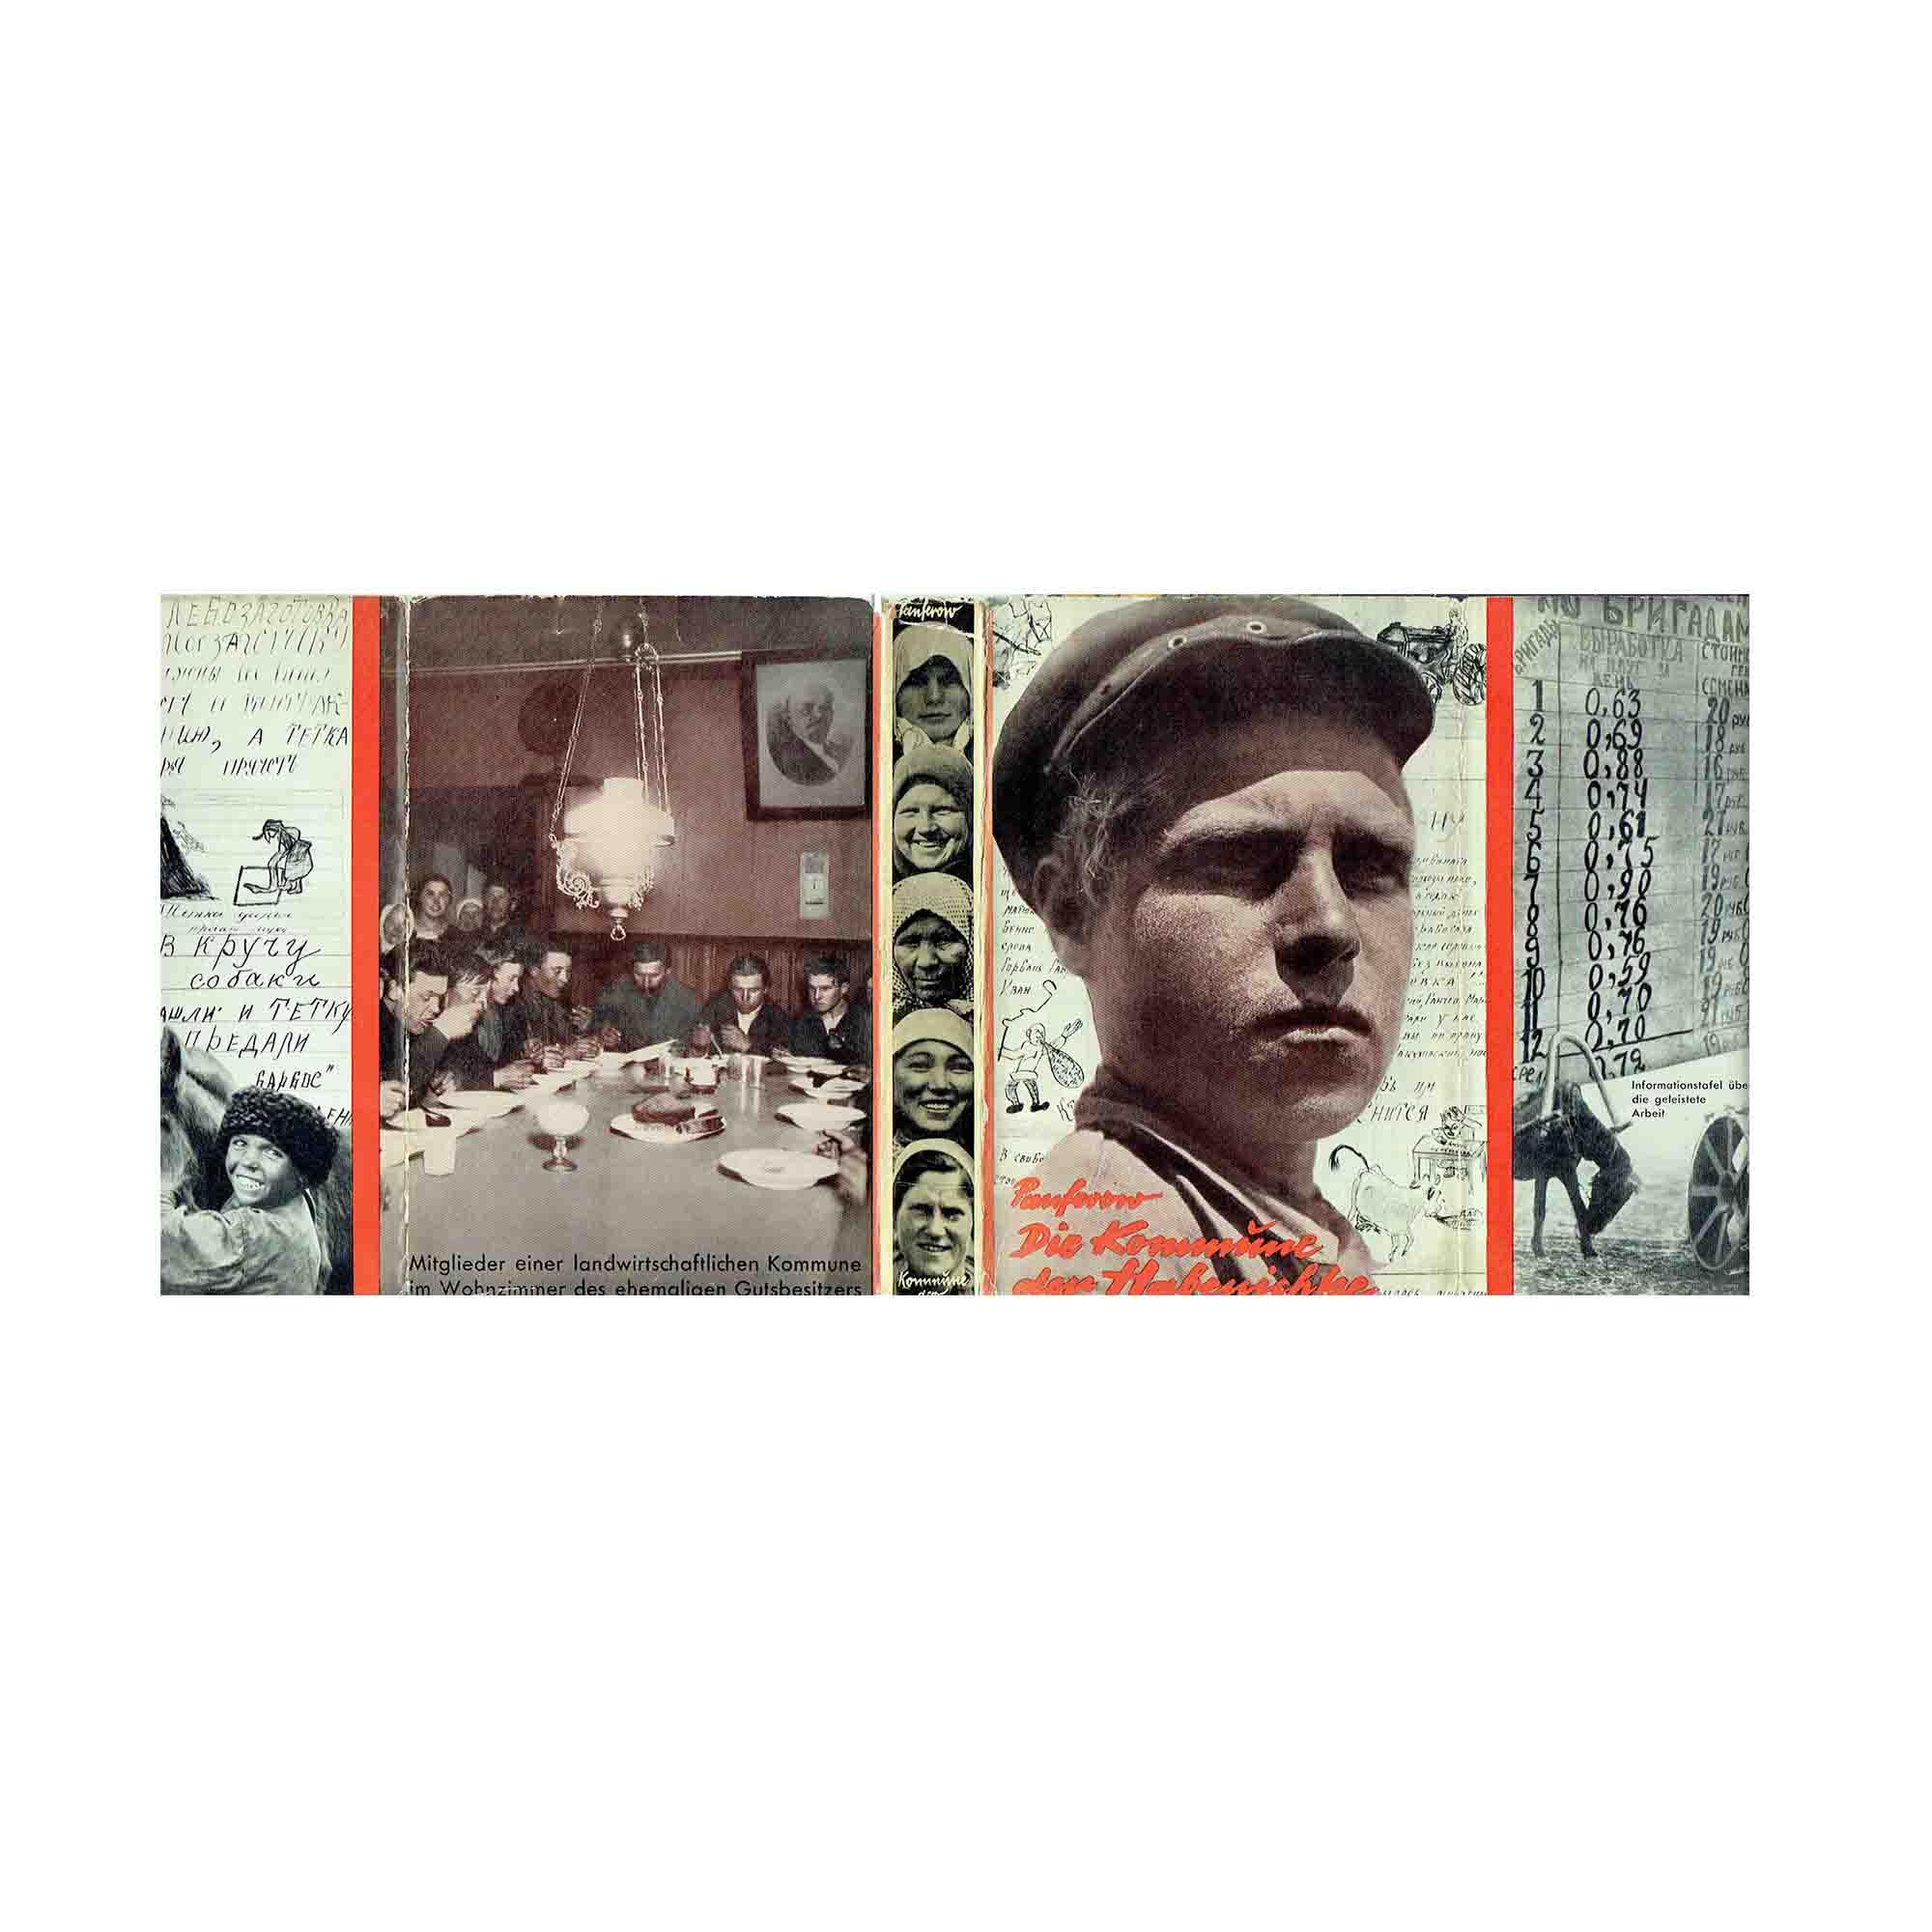 5270-Panferow-Heartfield-Kommune-1931-Umschlag-N.jpeg